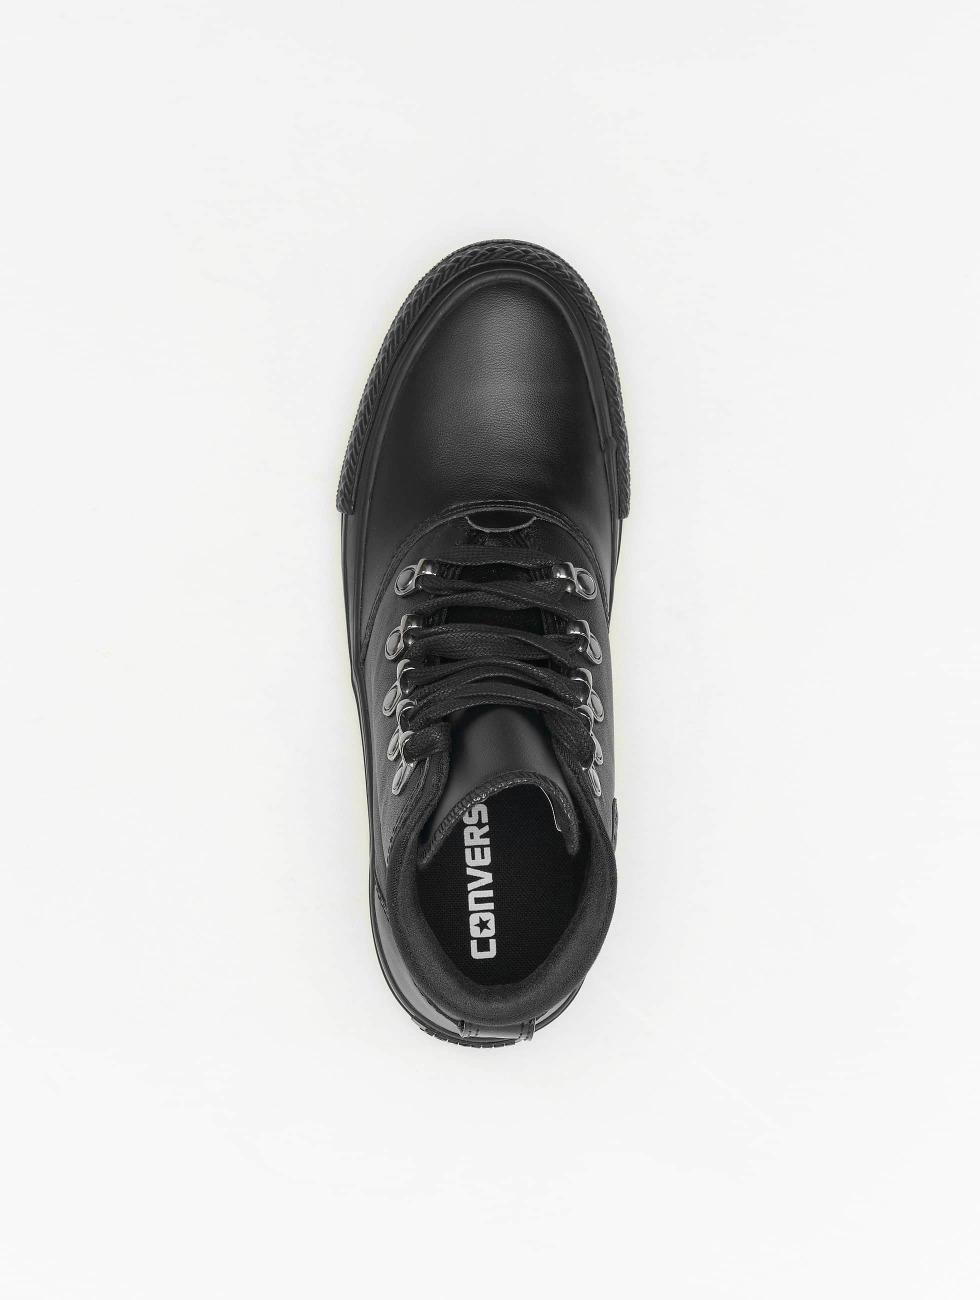 Converse schoen / sneaker Chuck Taylor All Star Ember in zwart 349044 Leveren Goedkope Online Goedkoopste Goedkope Prijs De Goedkoopste 92wMCM